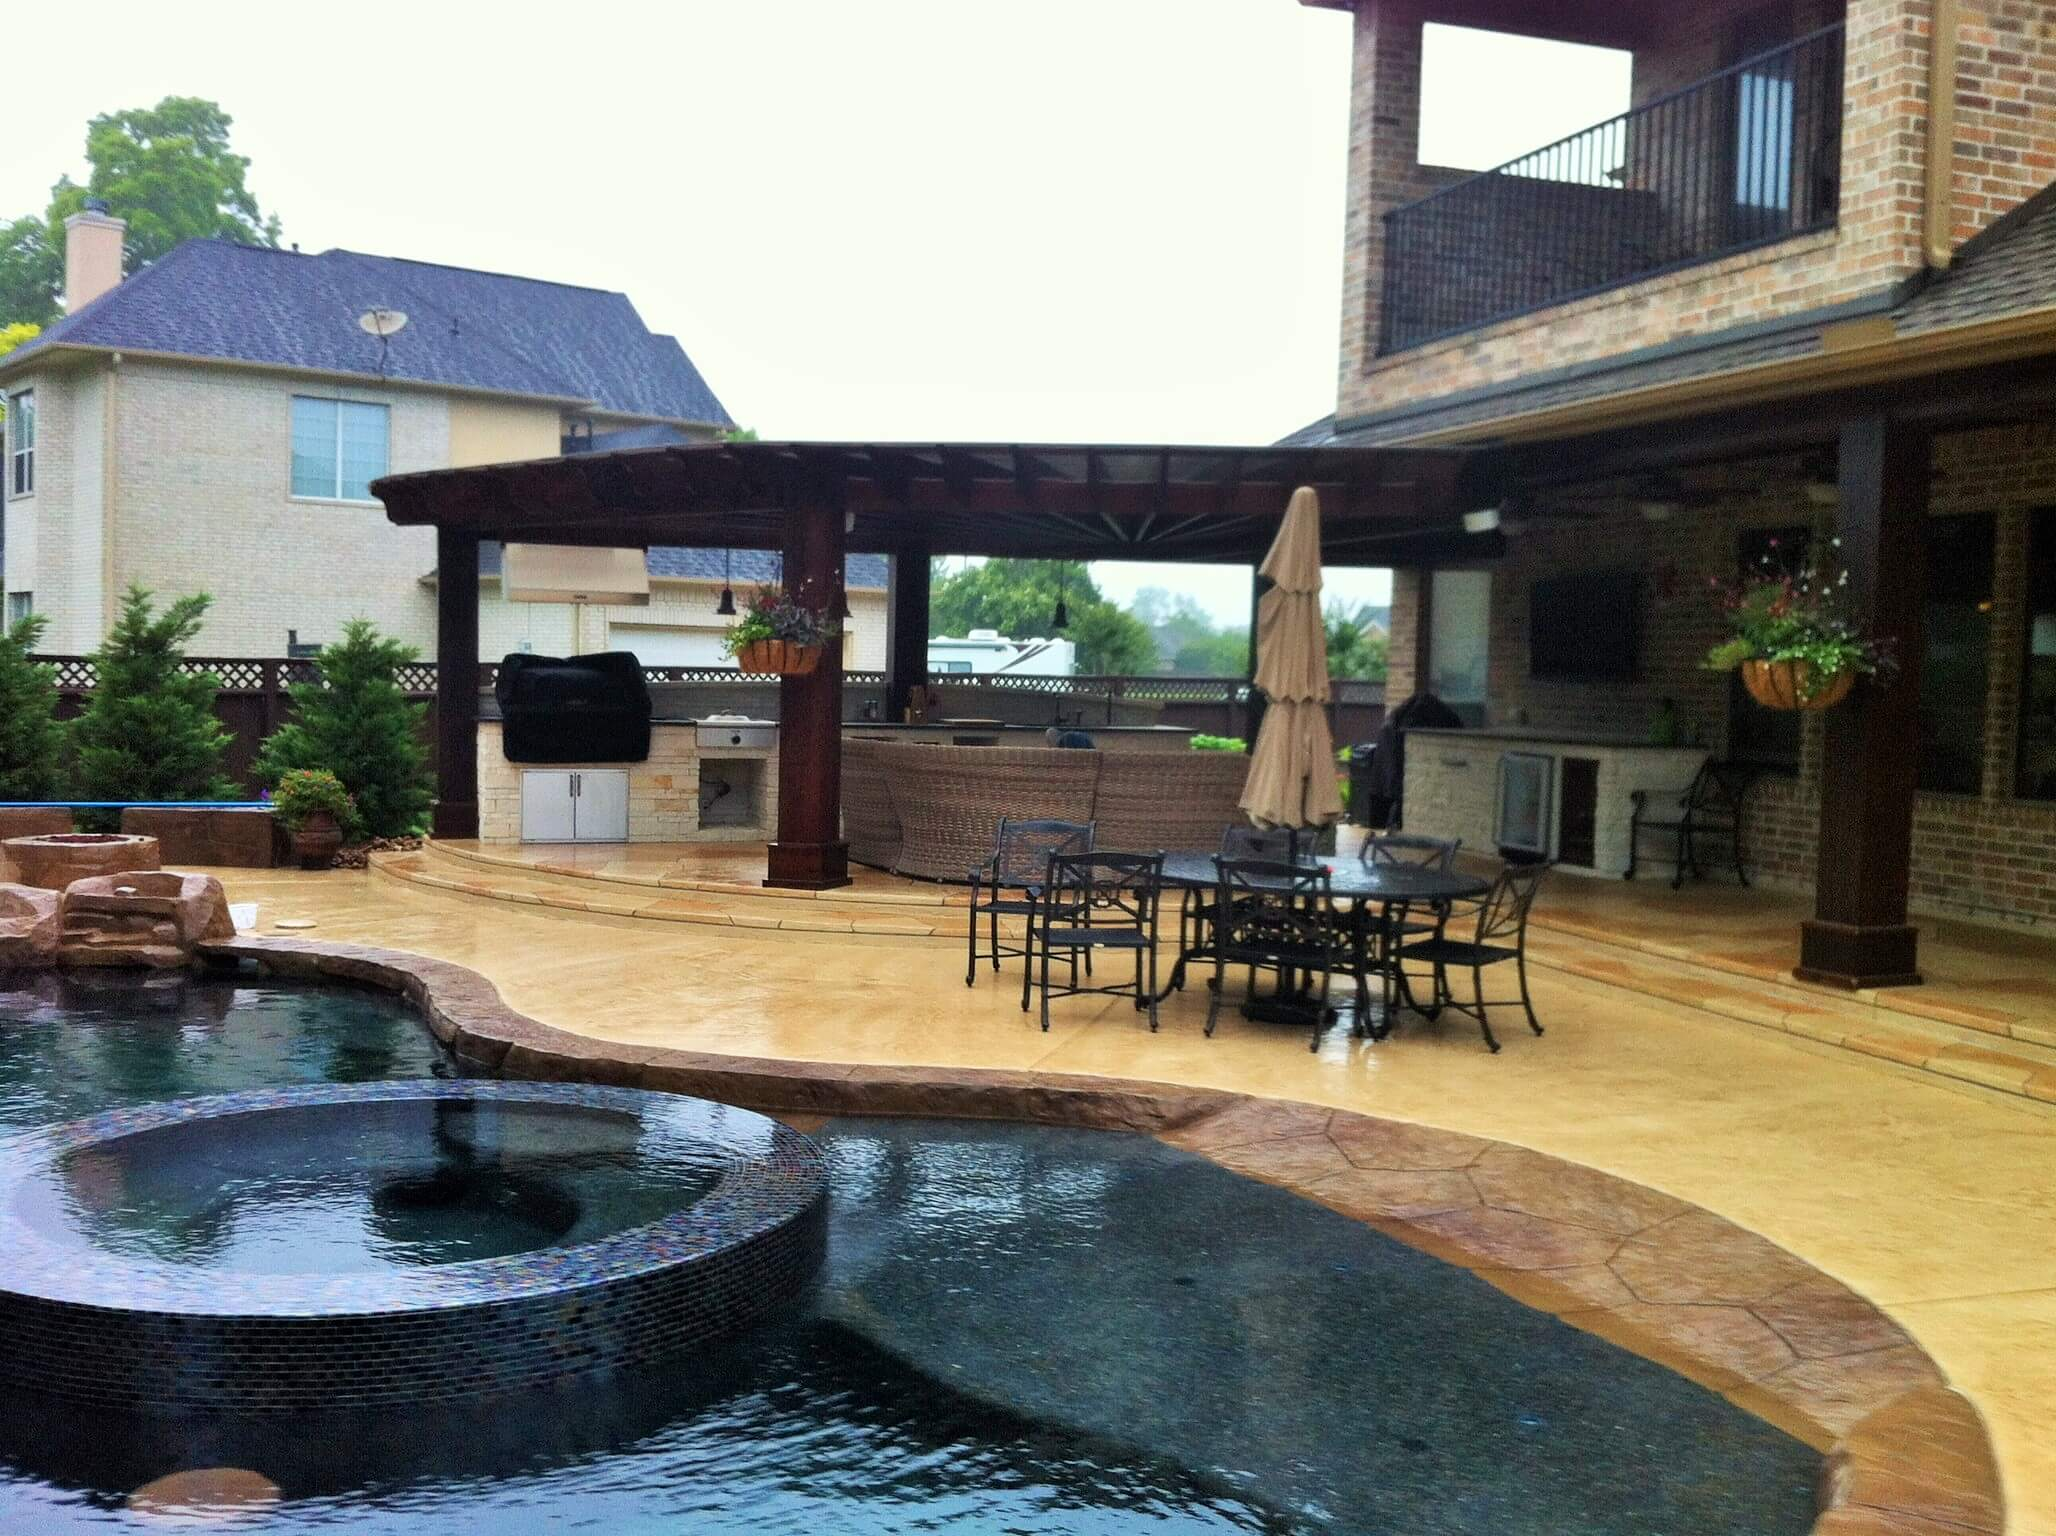 5 Pool Design & Outdoor Living Ideas to Modernize Your ... on Outdoor Living Designer id=85983